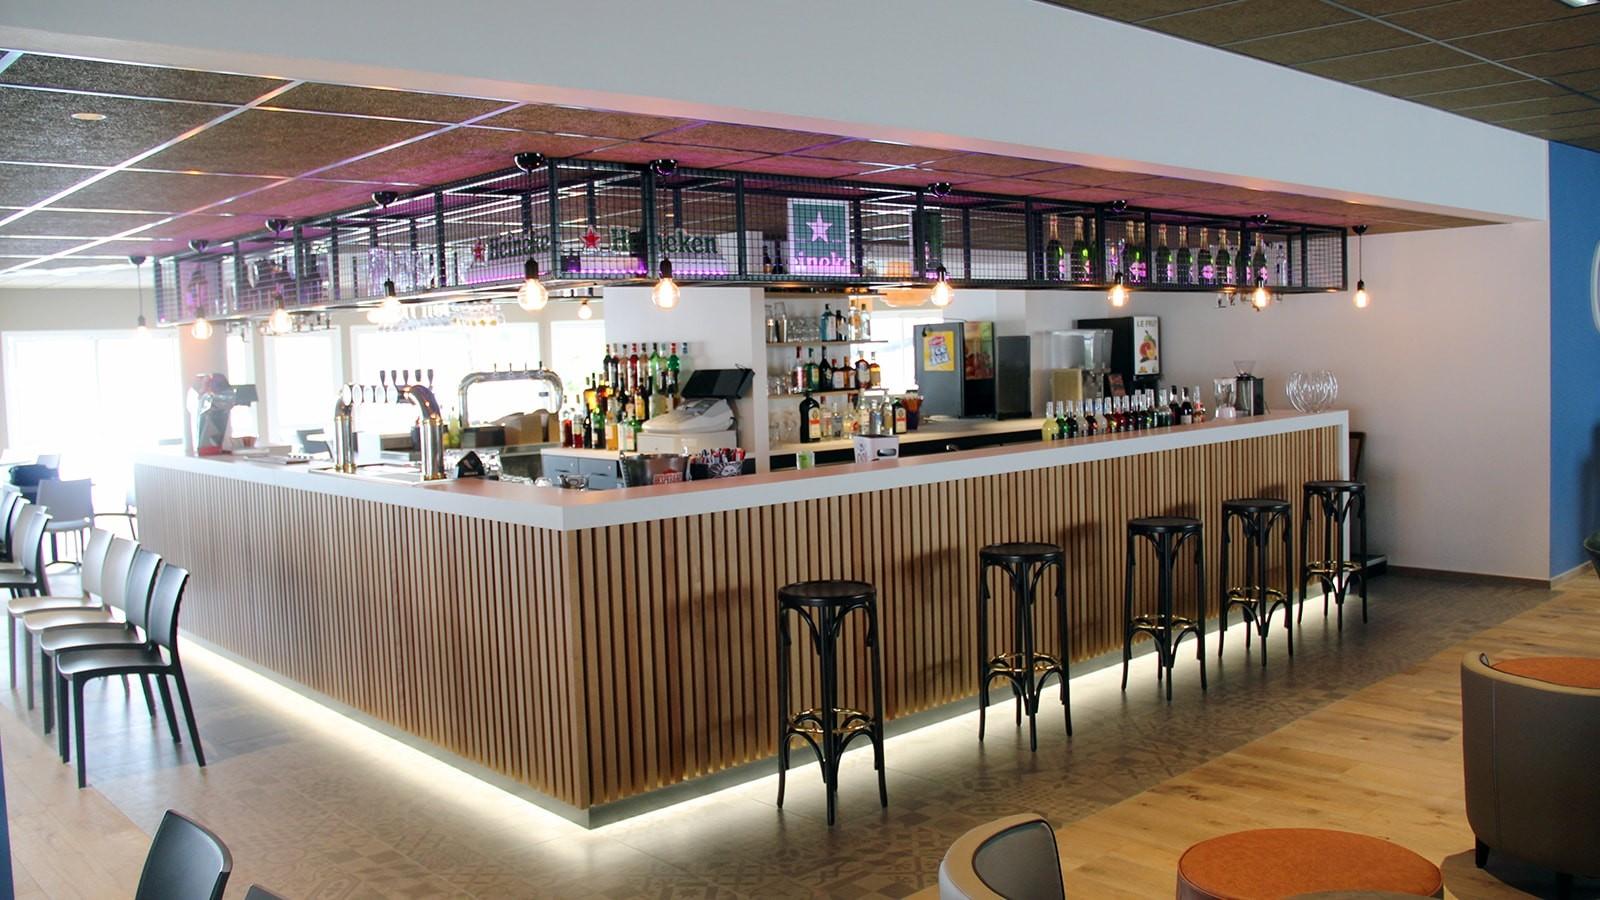 EFI Design Bar Clarys Saint Jean De Monts Efi Design (4) 1213